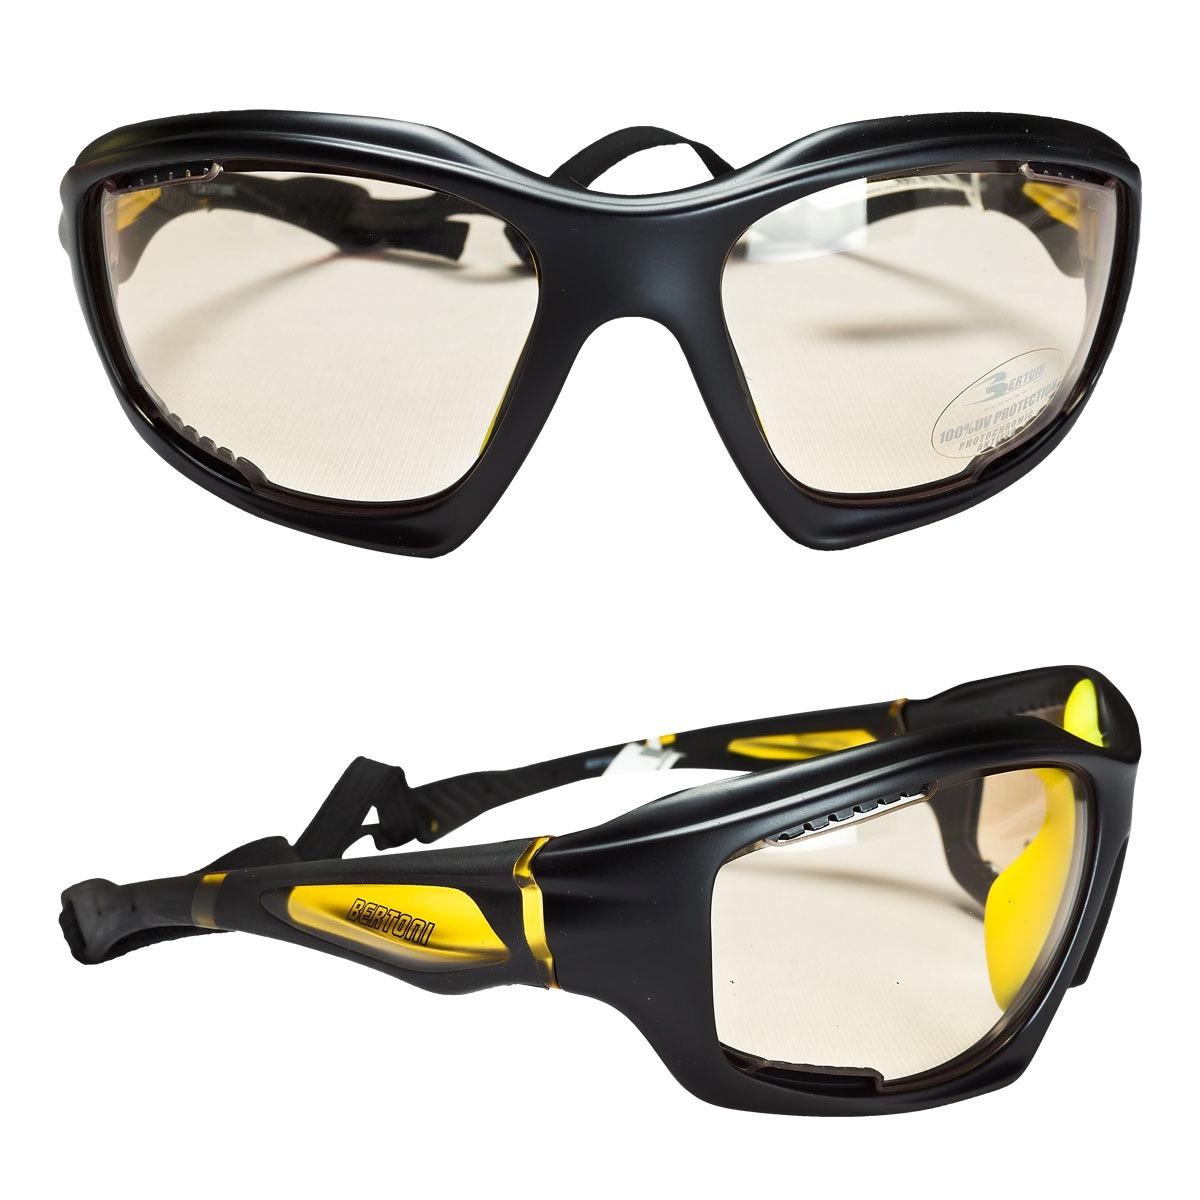 572e6b38c2 lentes italianos deportivos fotocromaticos bertoni f1000c. Cargando zoom.